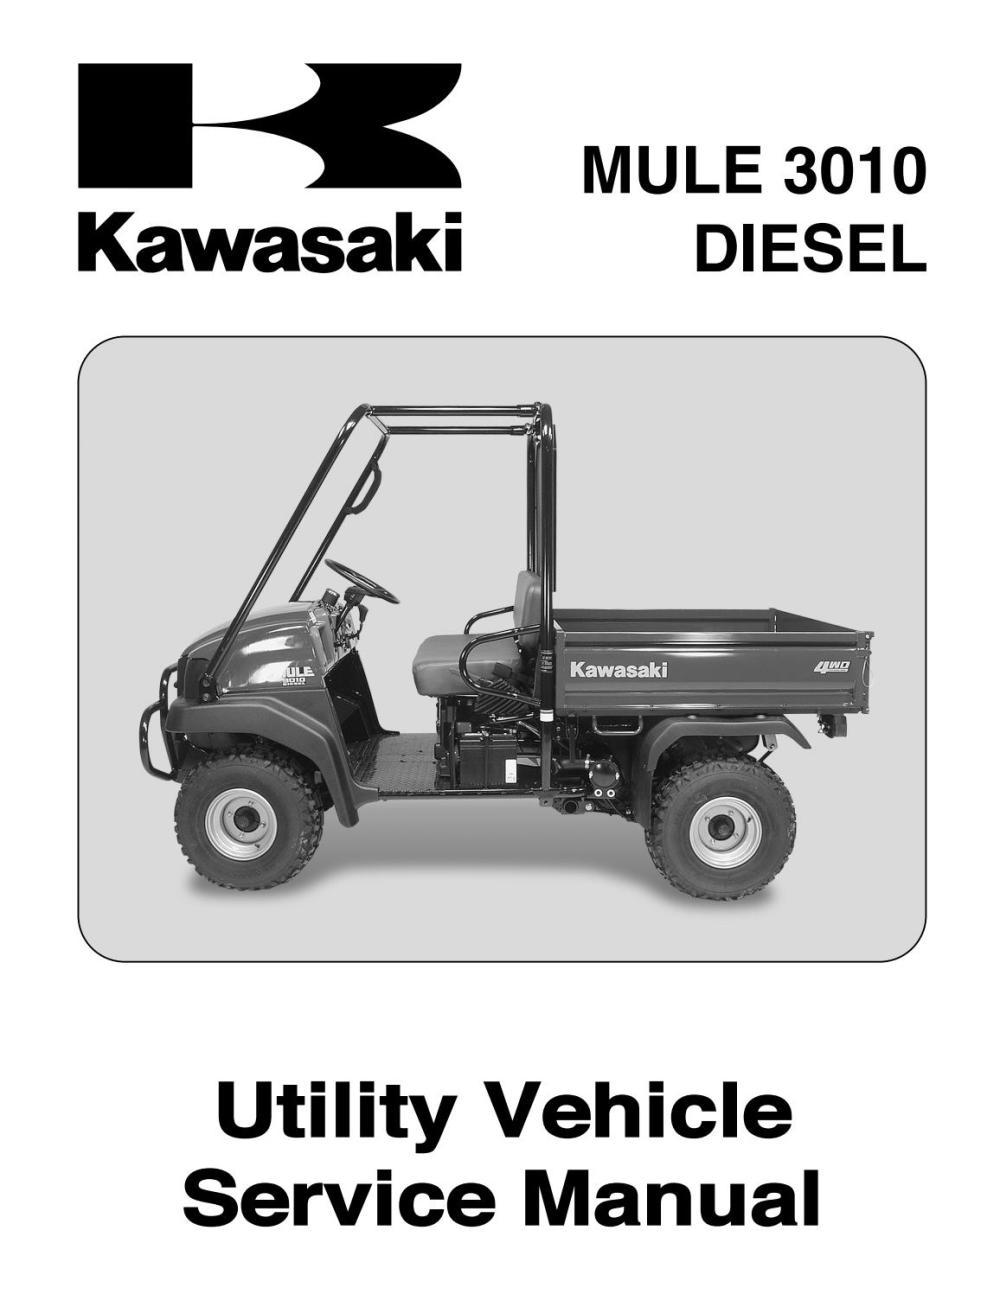 medium resolution of 2004 kawasaki mule 3010 kaf950b1 diesel service repair manual